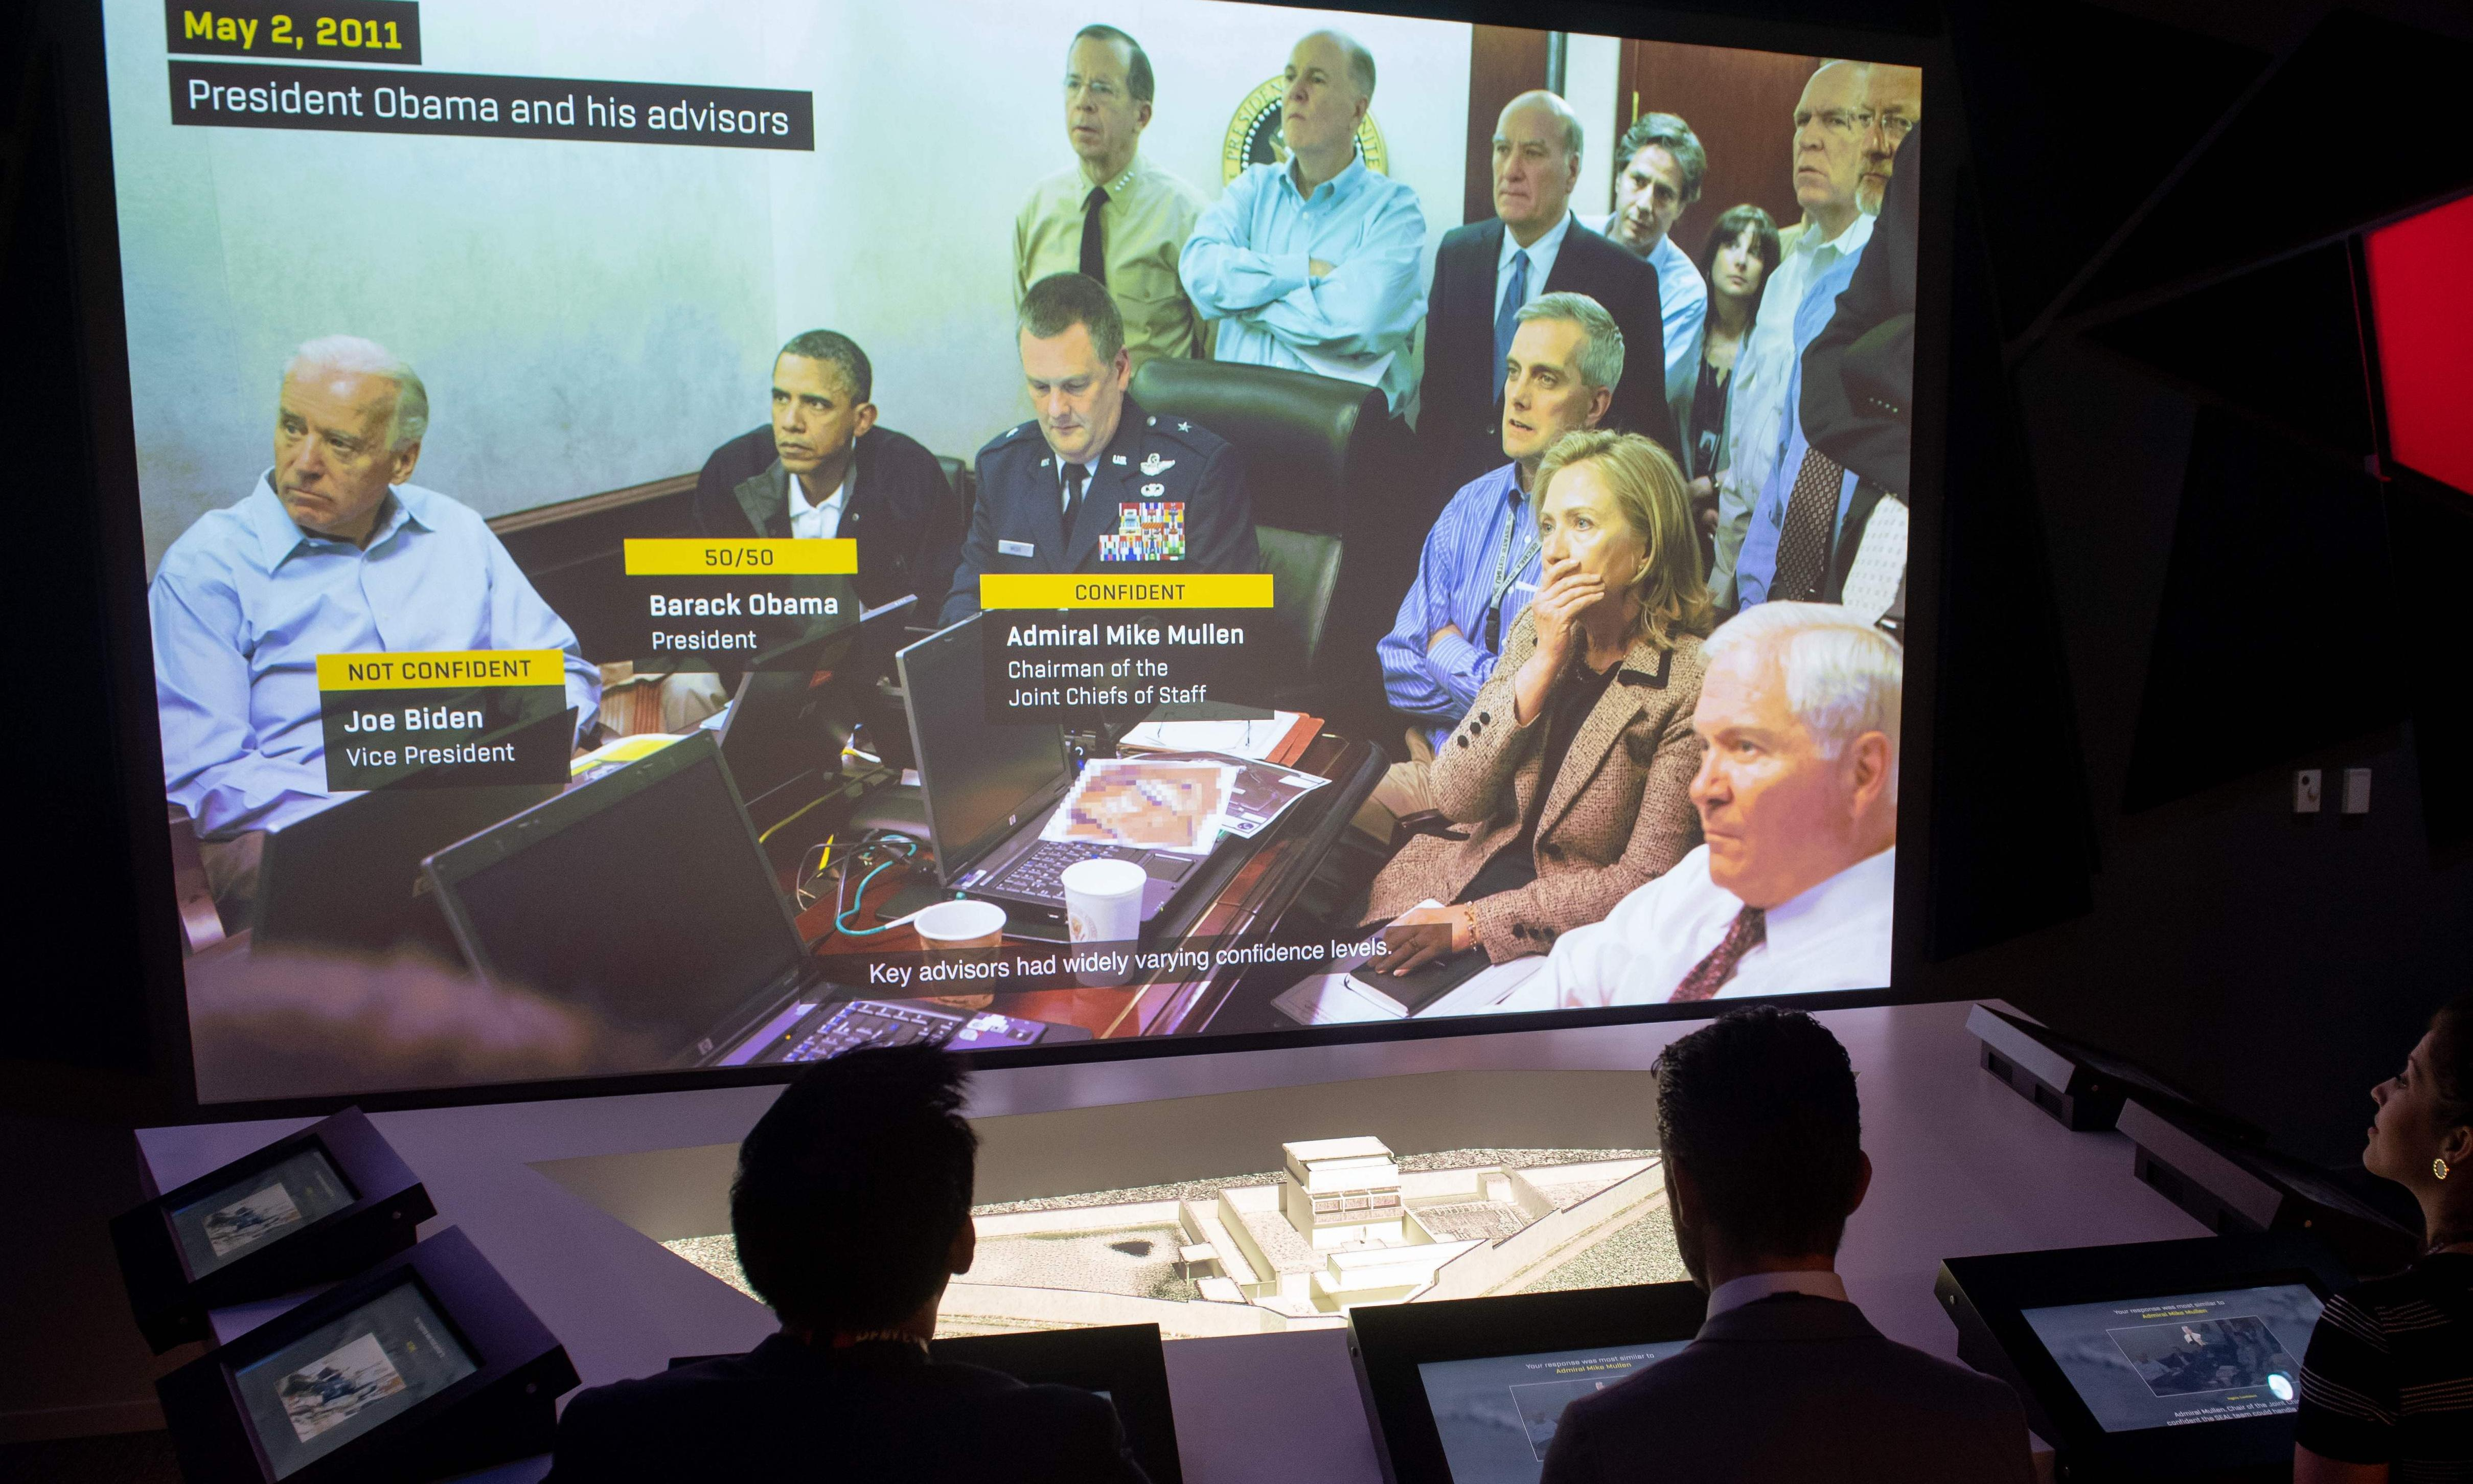 Now kids, help us to kill Bin Laden! The dark side of Washington's spy museum